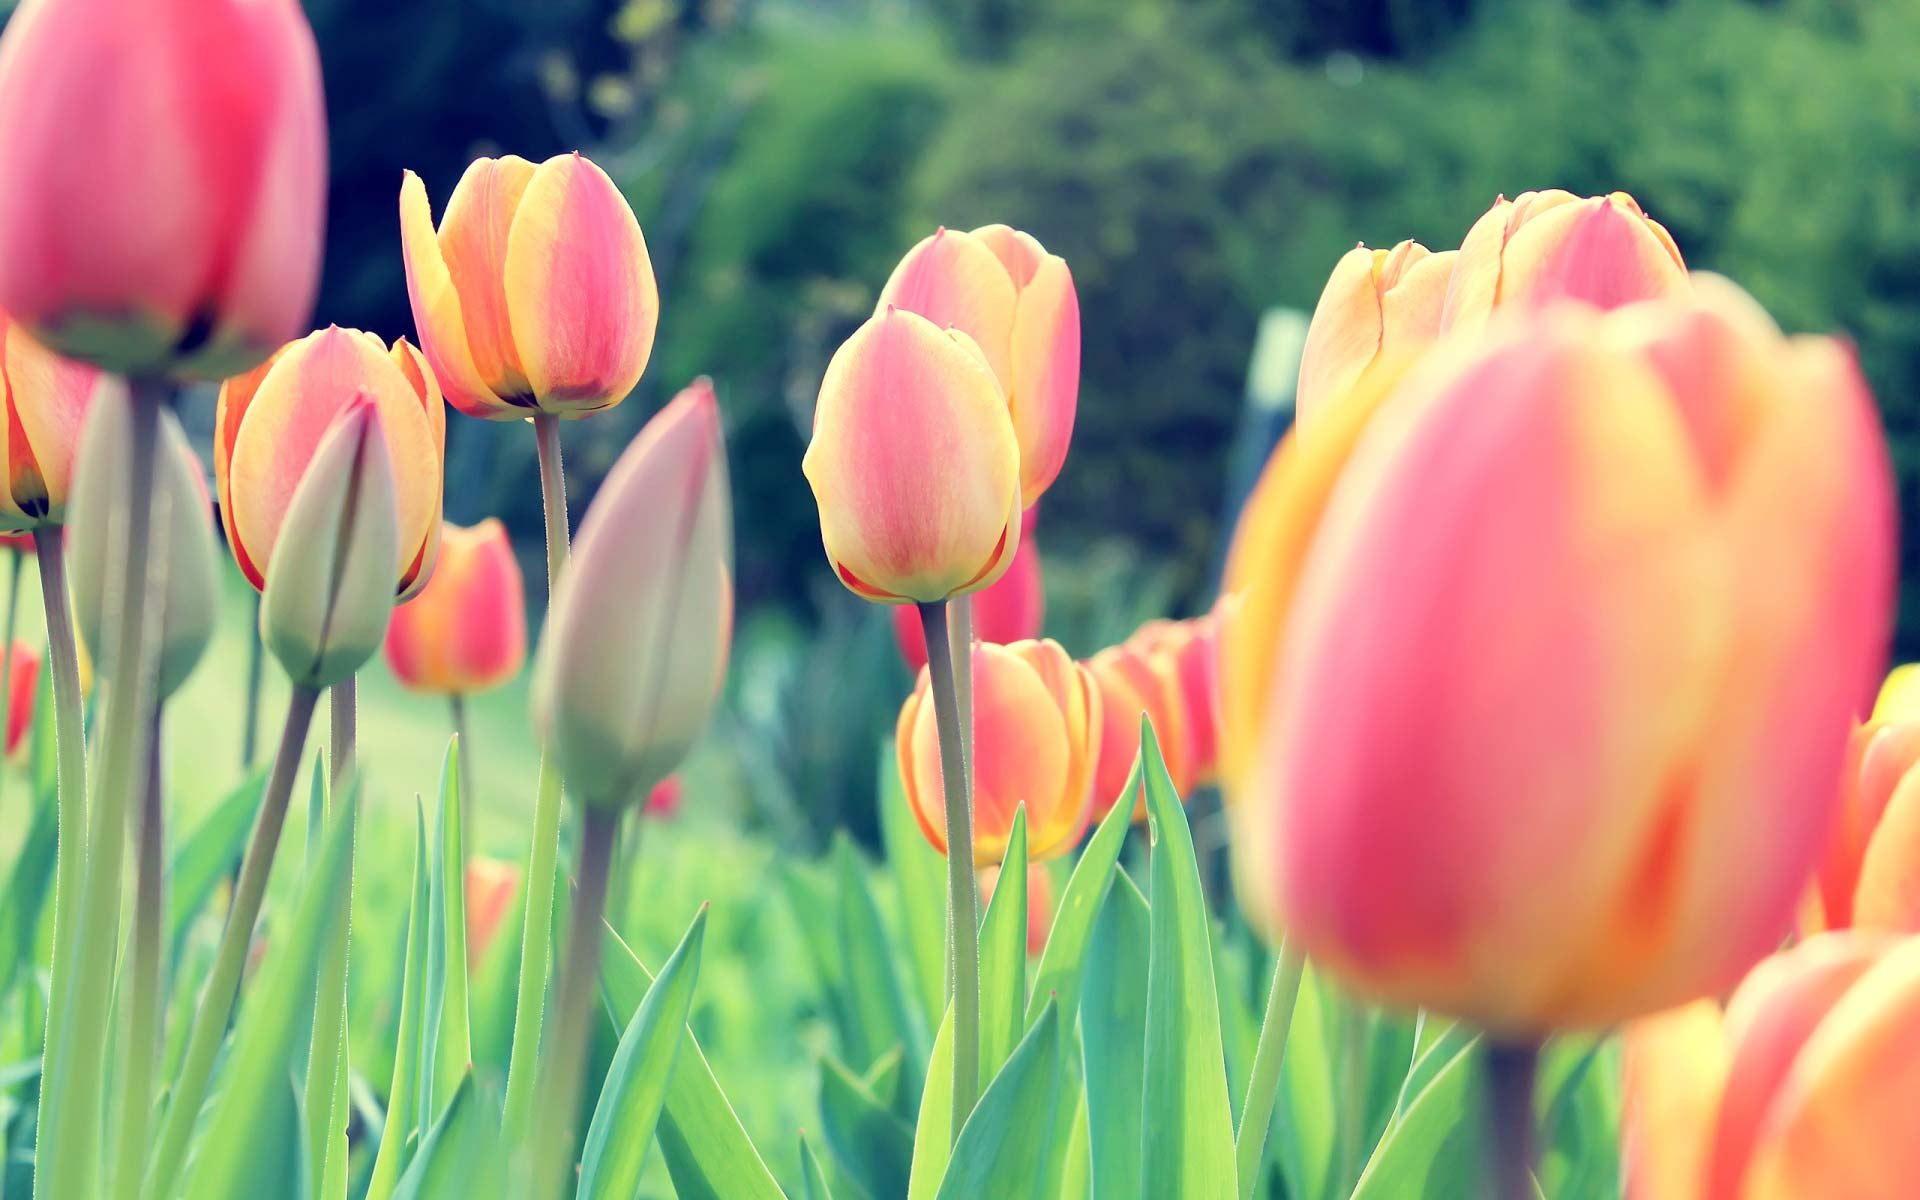 Papel de parede flores tulipas papel de parede gr tis - Tulipas para ventiladores de techo ...